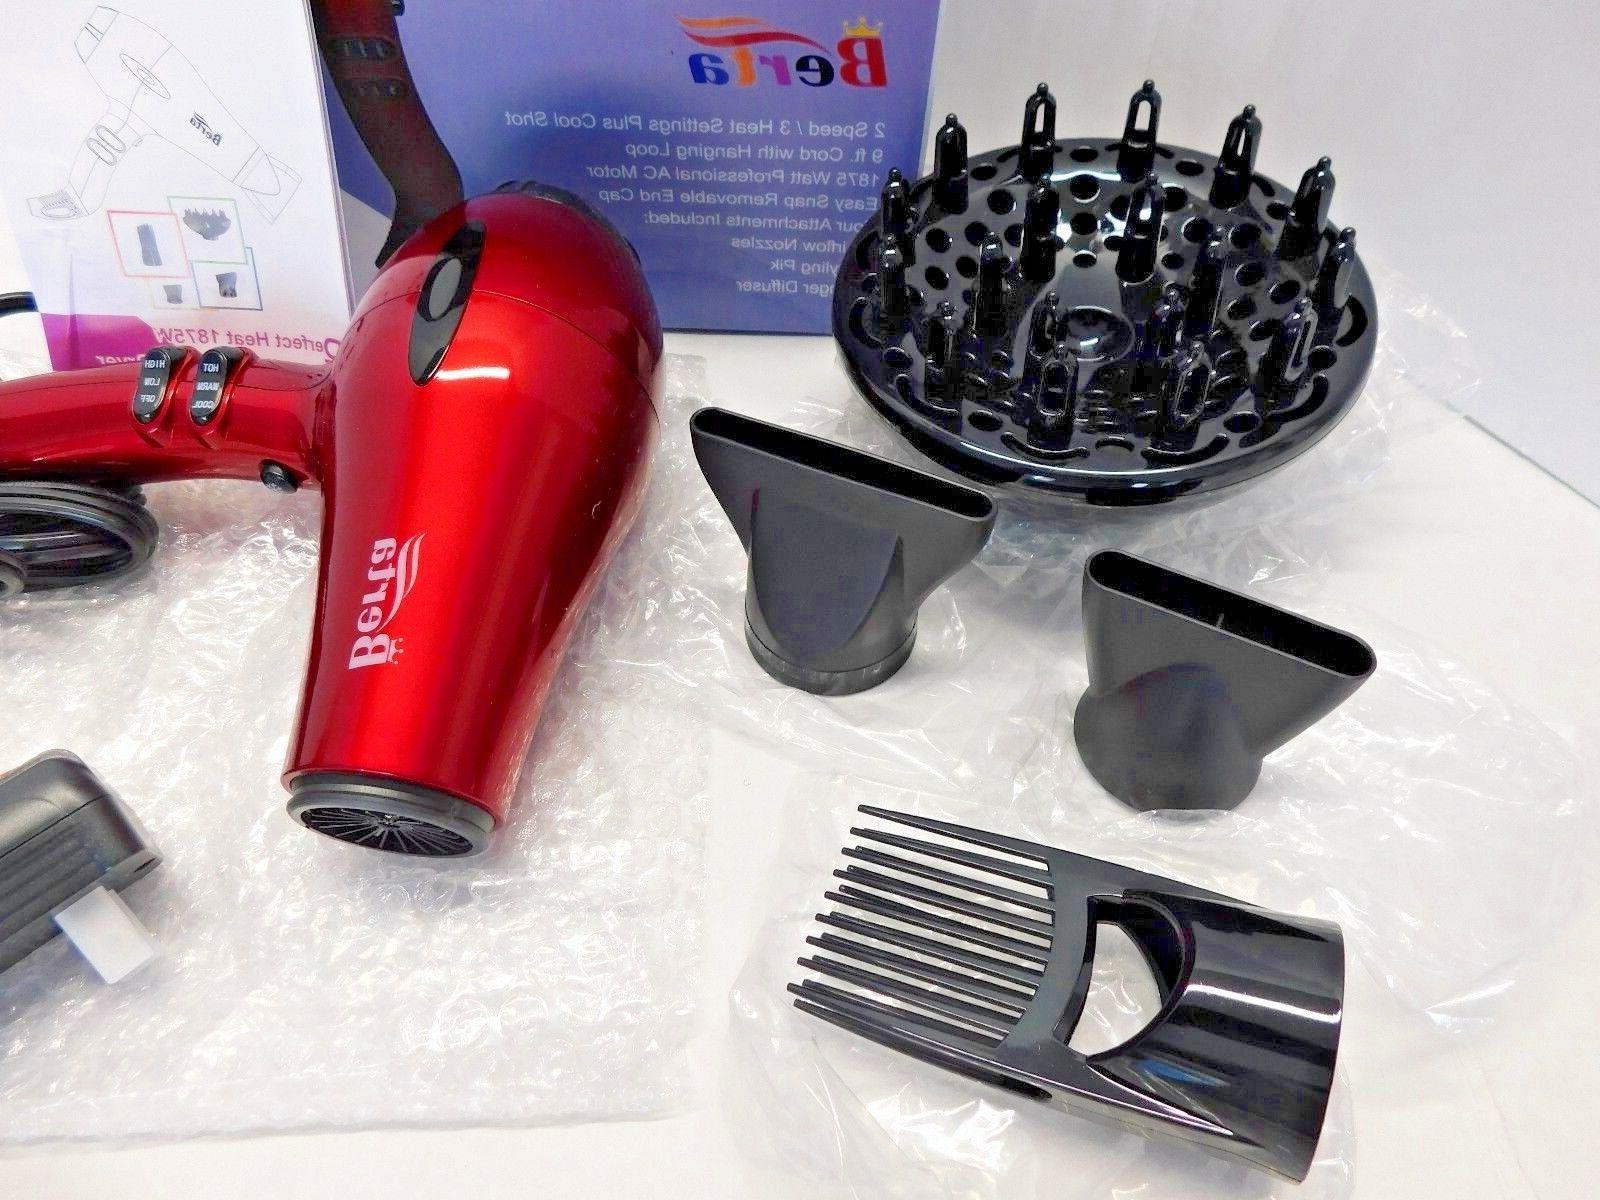 Berta Speed & Heat Hair With Accessories,